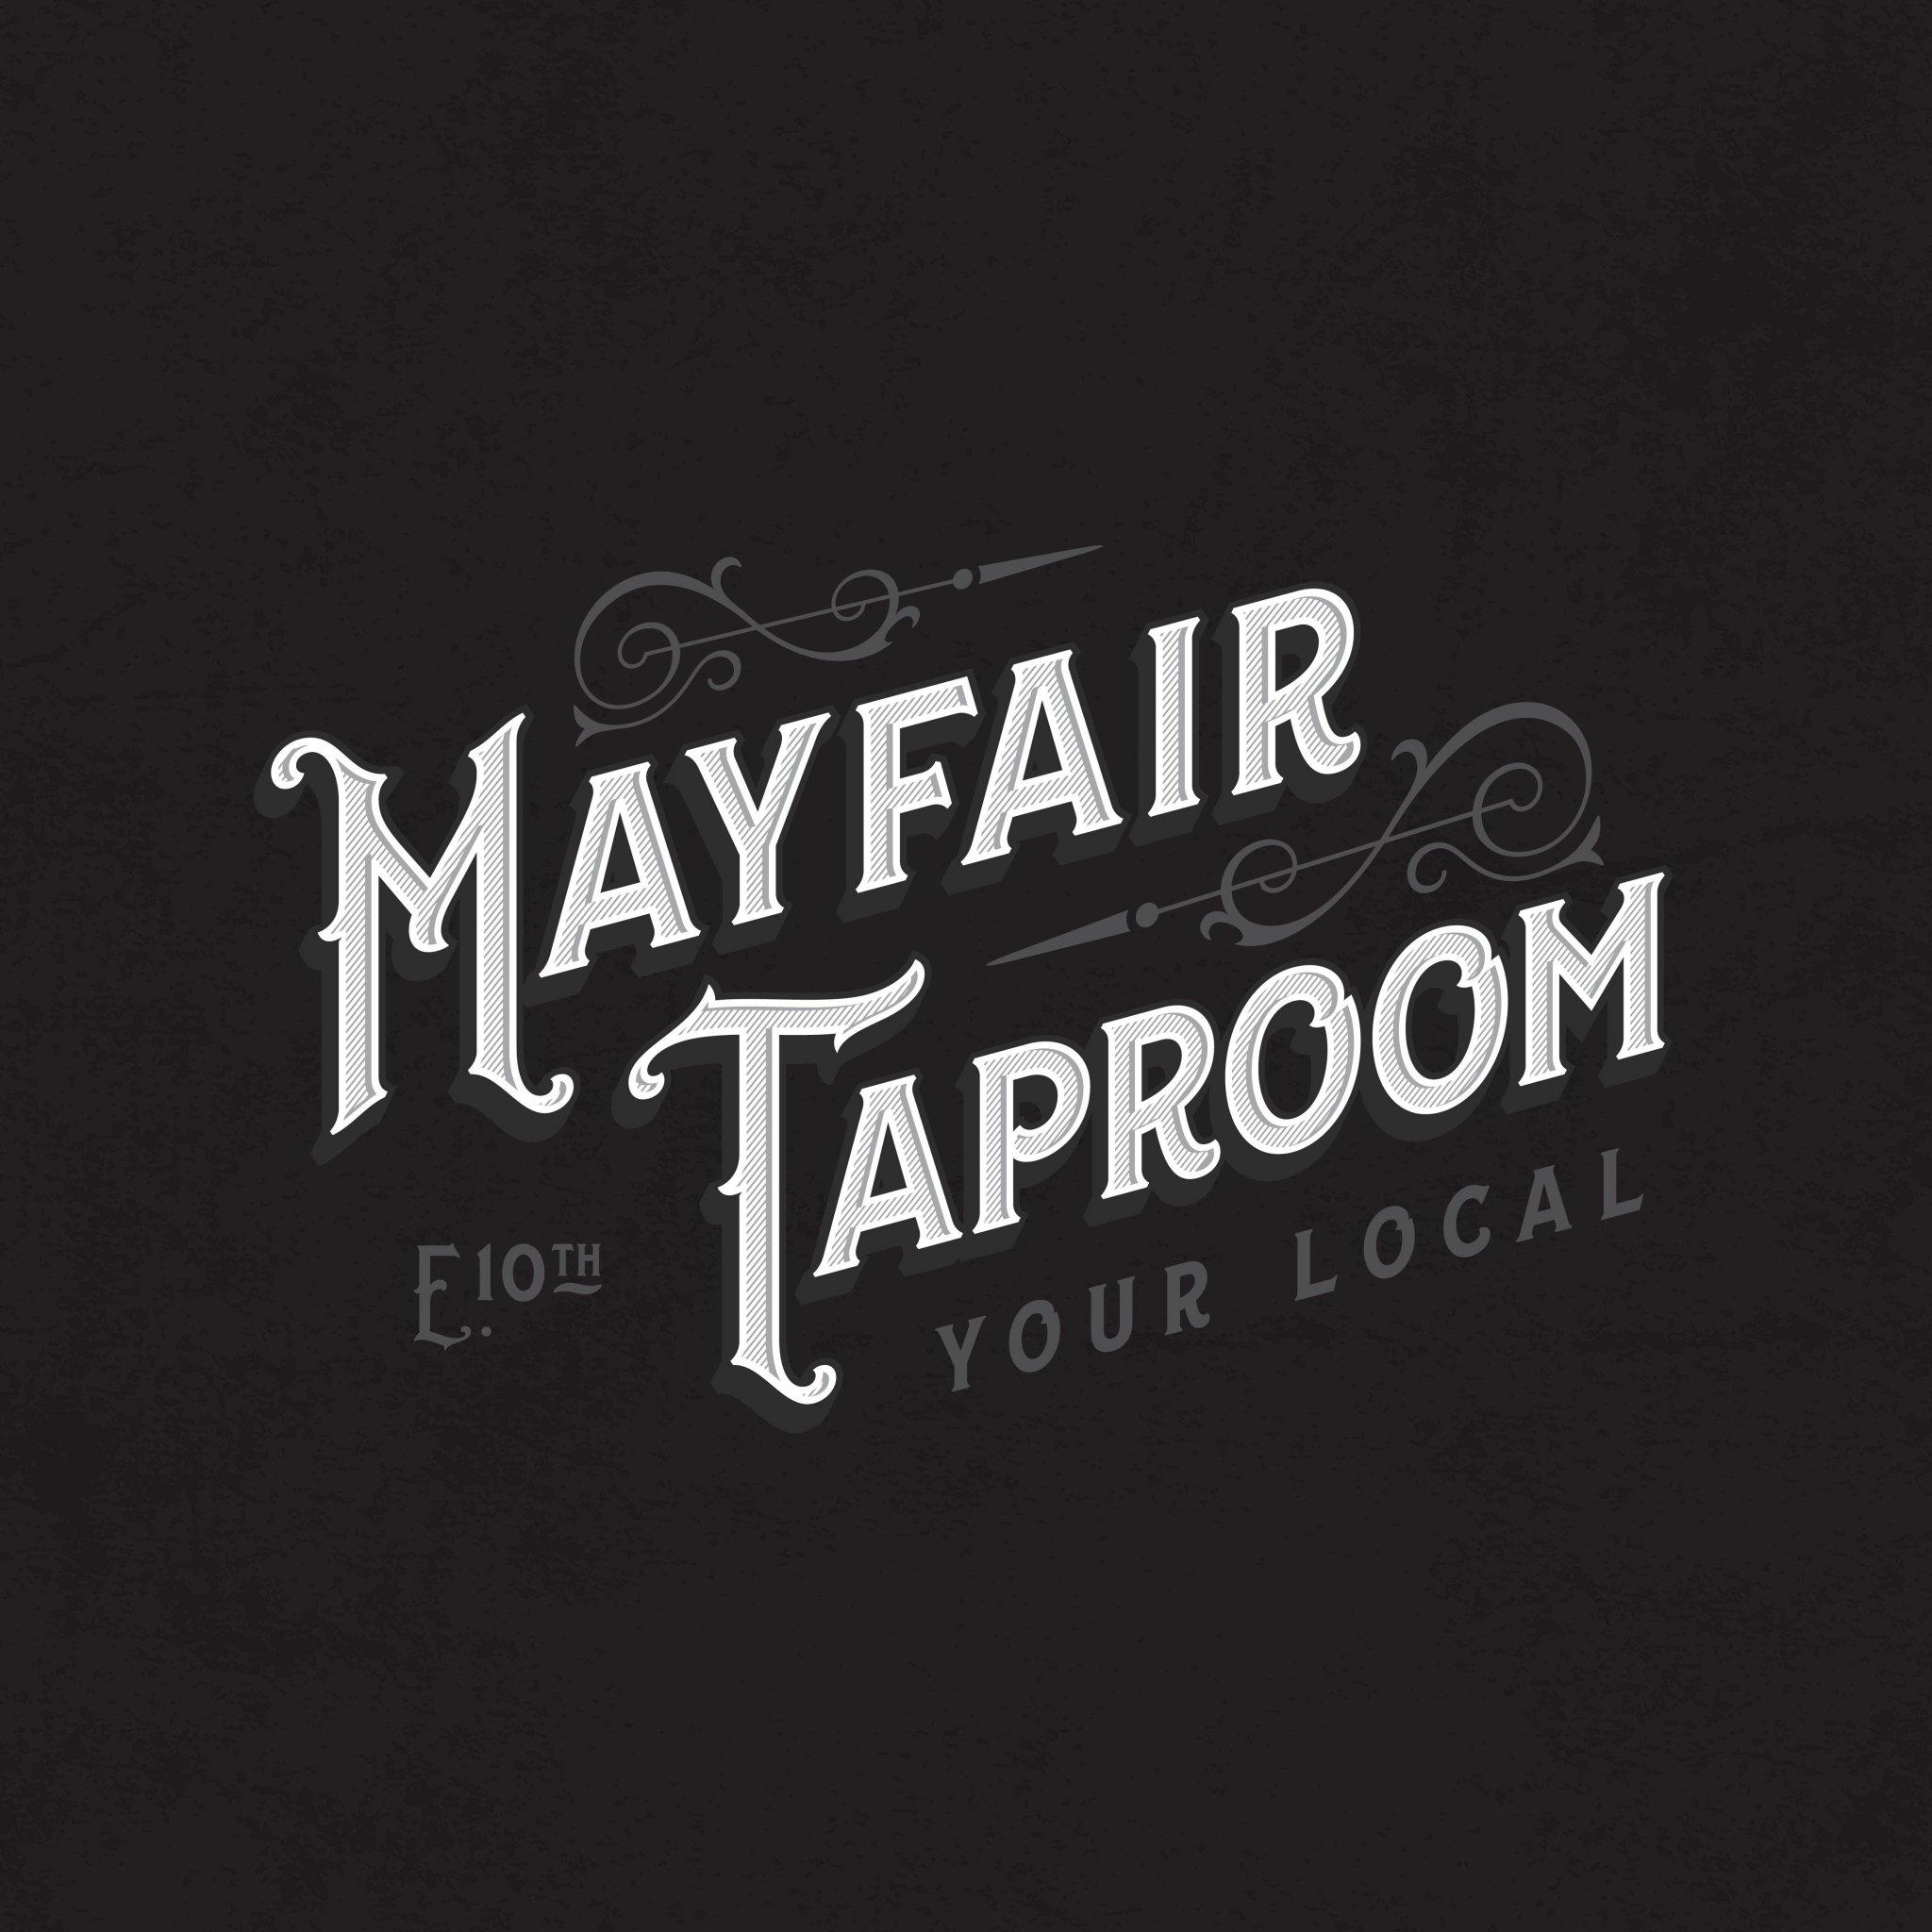 Mayfair Taproom